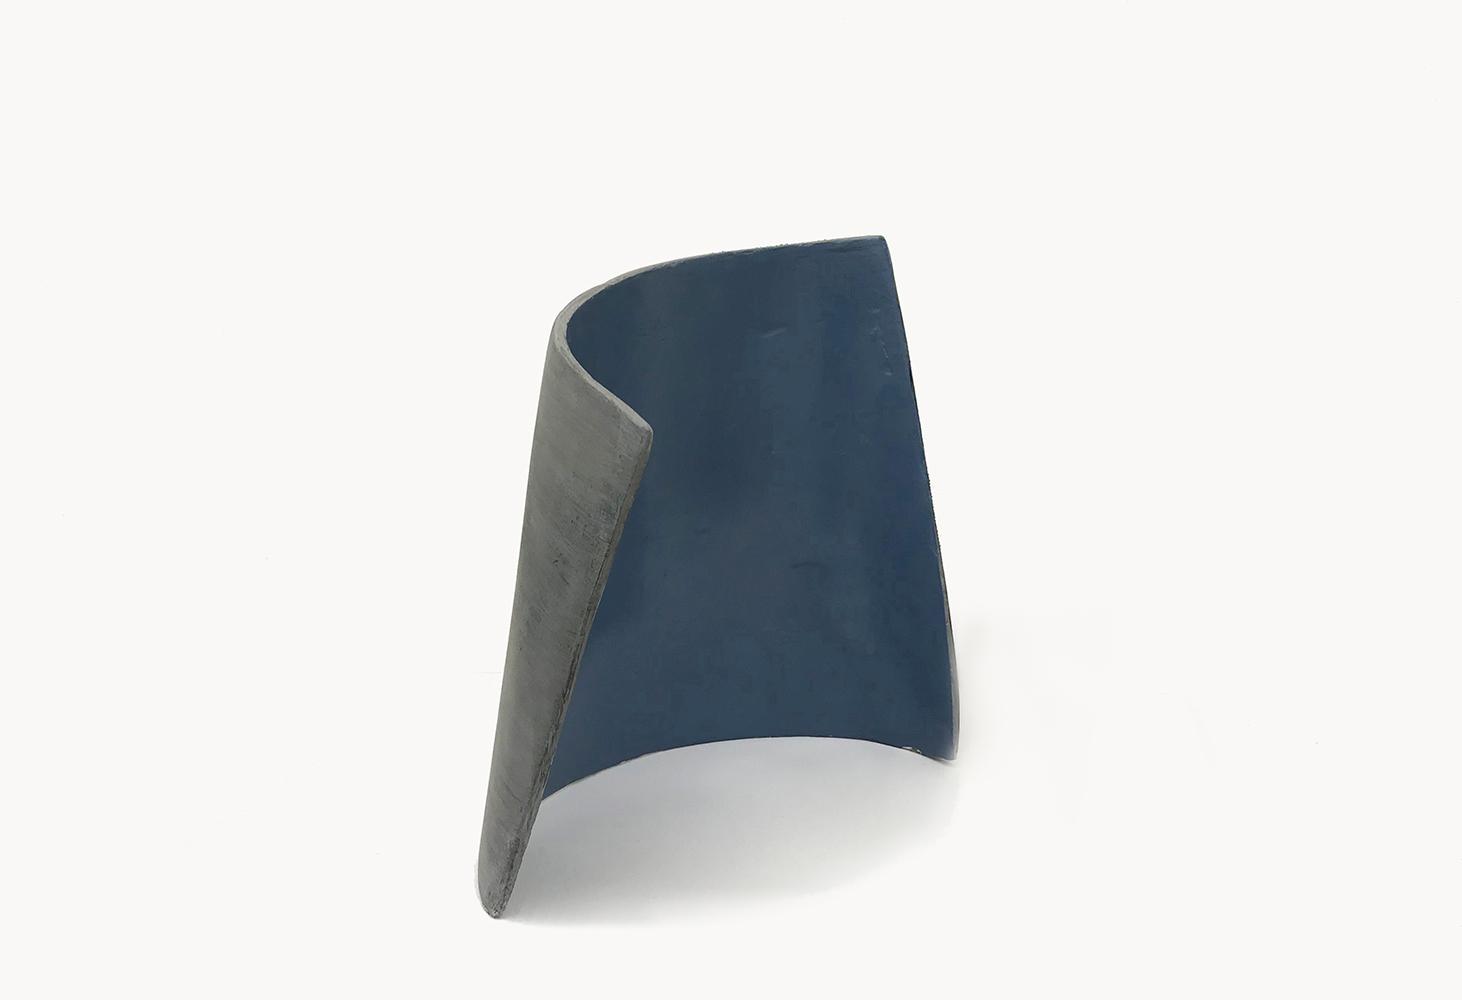 Simone Rochon, Formes fléchies no. 1 , 2017, plaster, fiber glass and acrylic paint, dimensions variable.